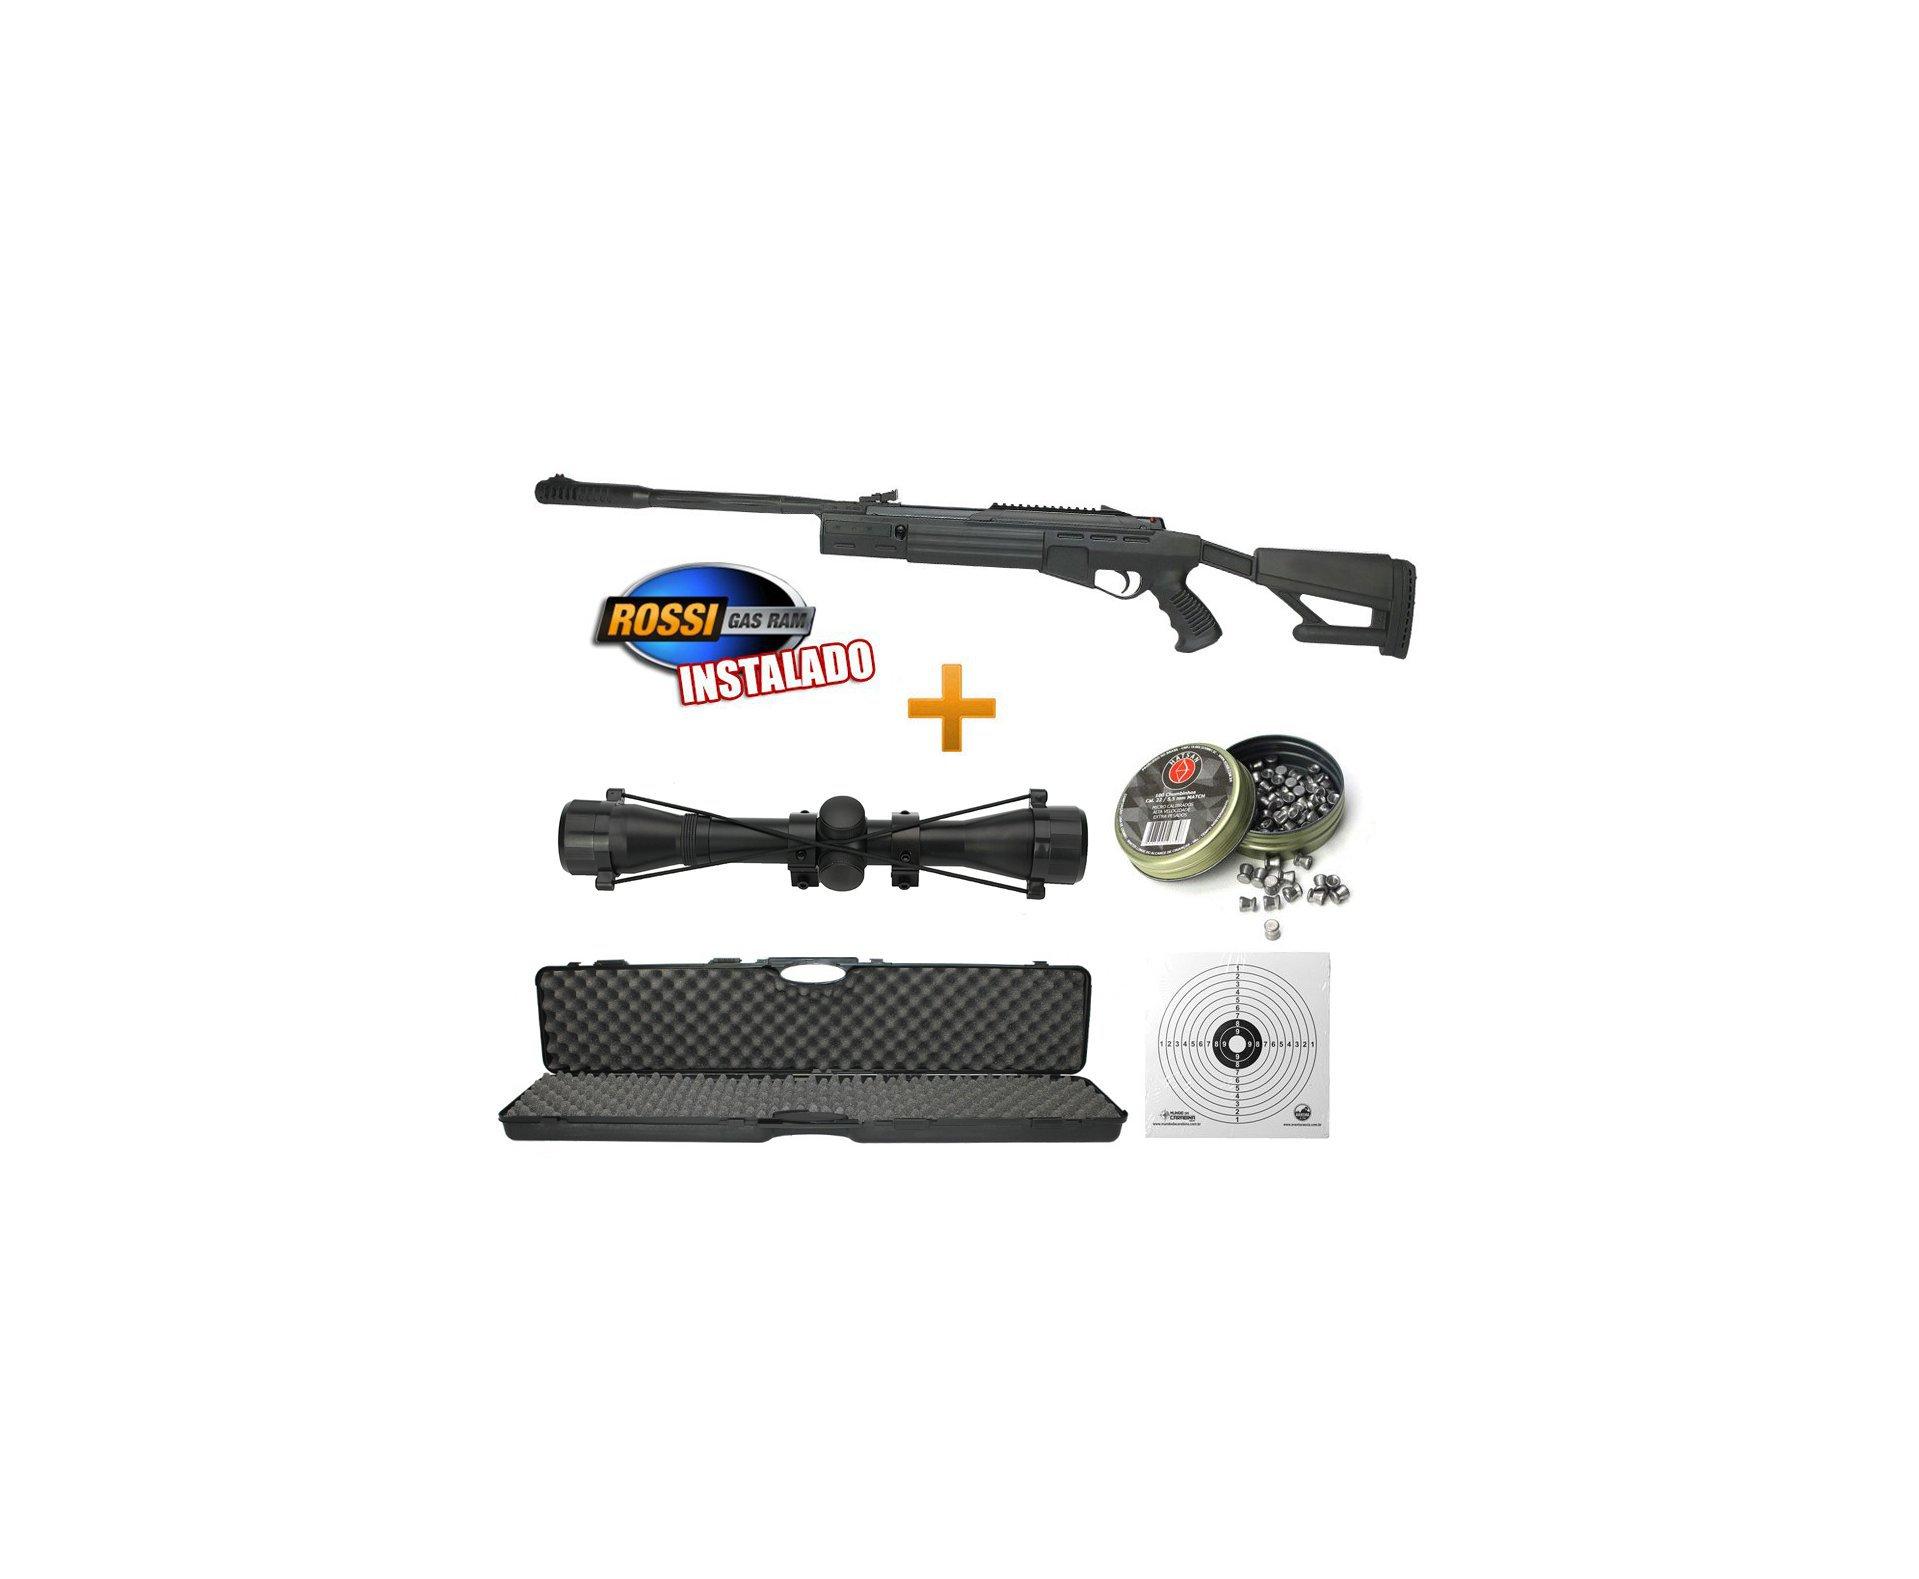 Carabina De Pressão Hatsan Striker Airtact Combo Especial - Cal 5,5mm + Gas Ram + Luneta 4x32 + Alvo + Chumbinho + Case Rossi